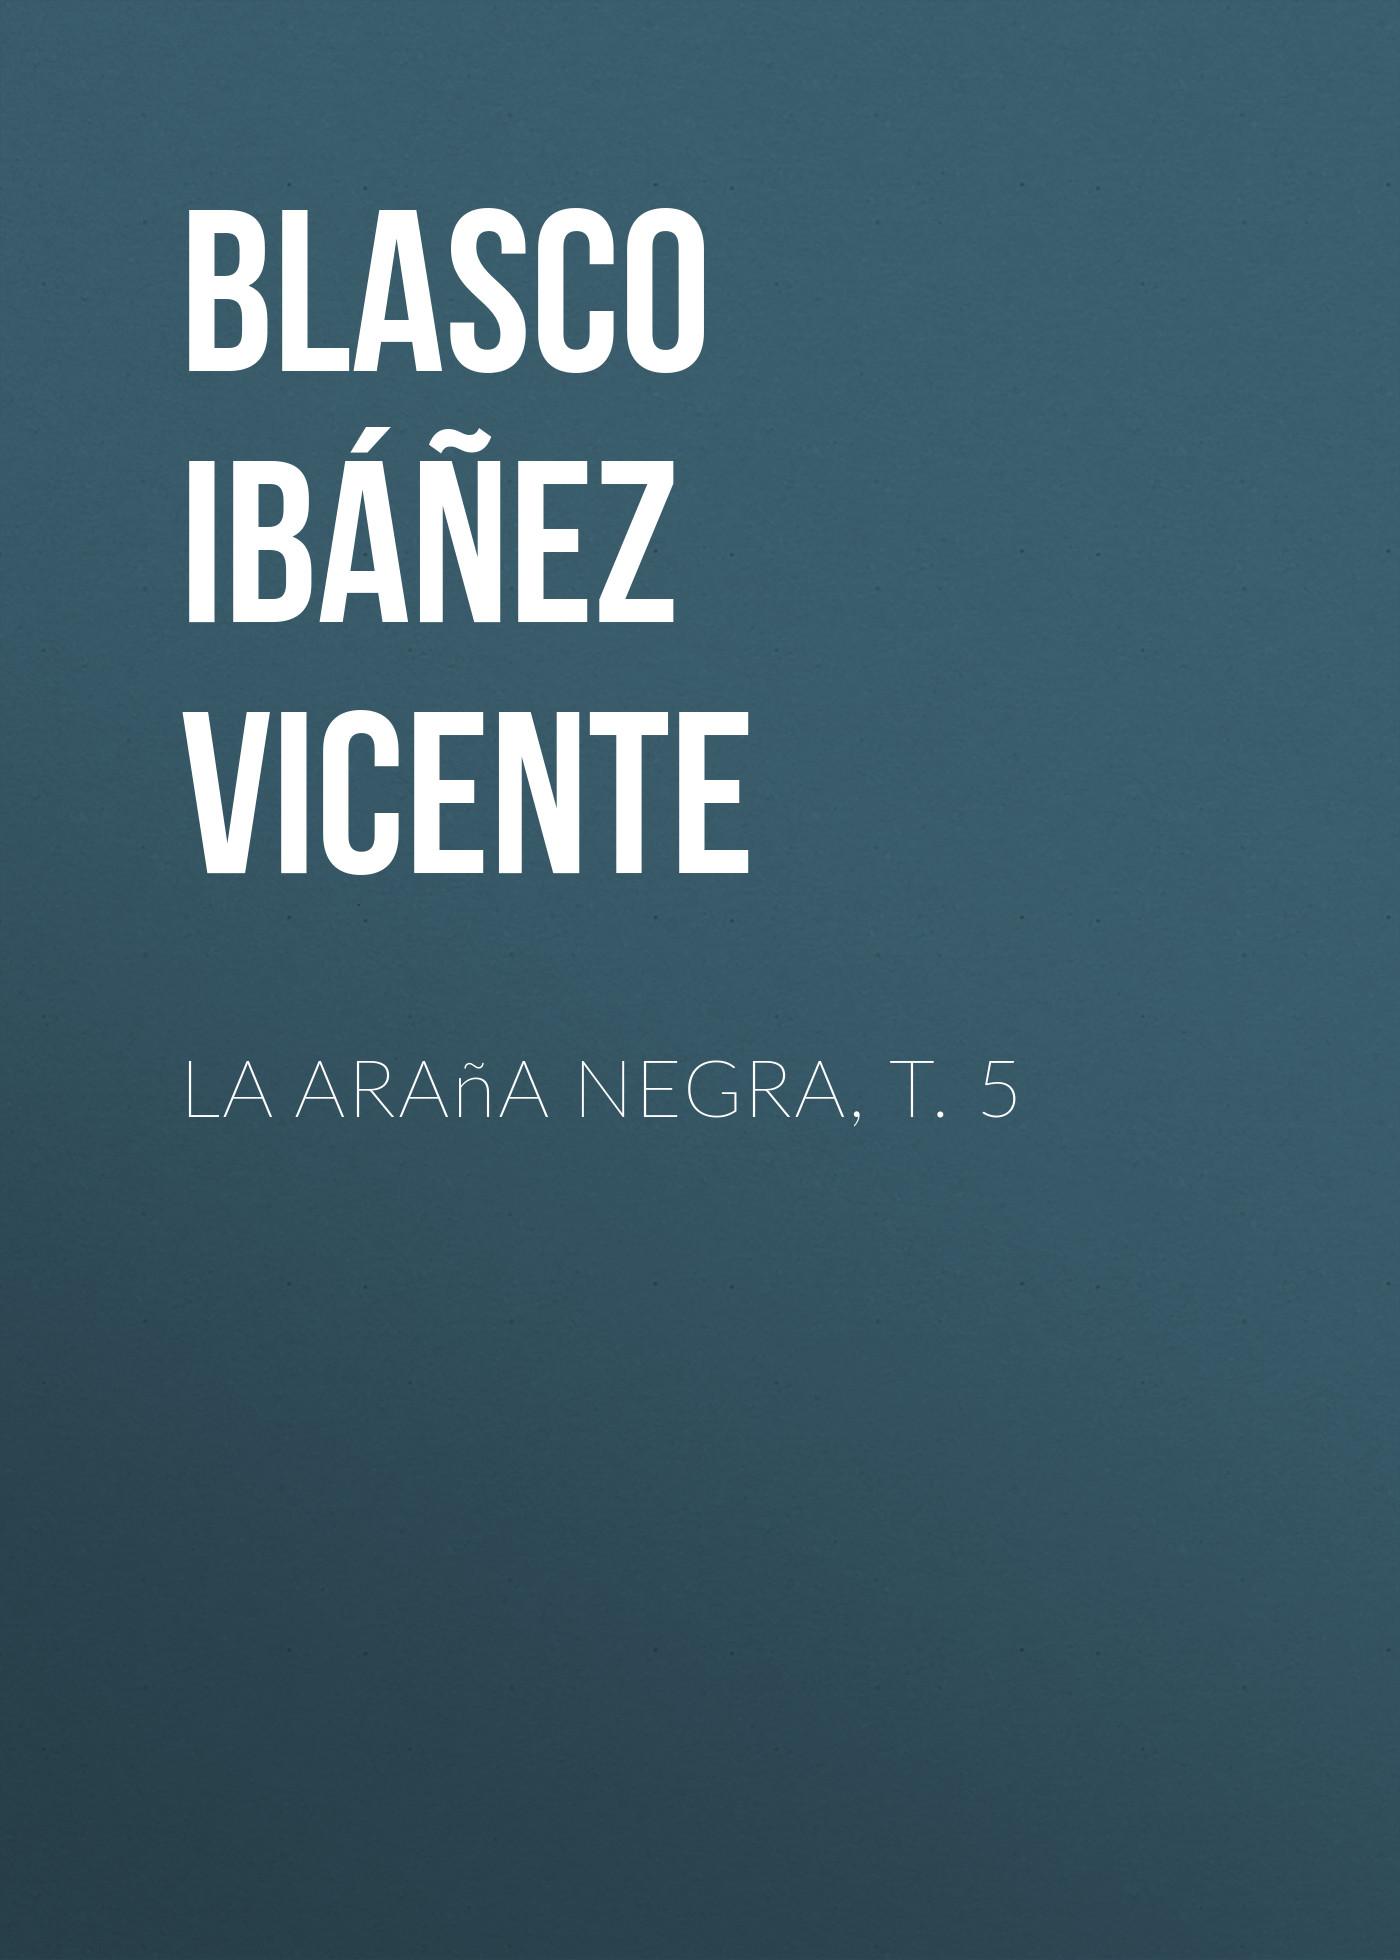 Blasco Ibáñez Vicente La araña negra, t. 5 blasco ibáñez vicente la araña negra t 1